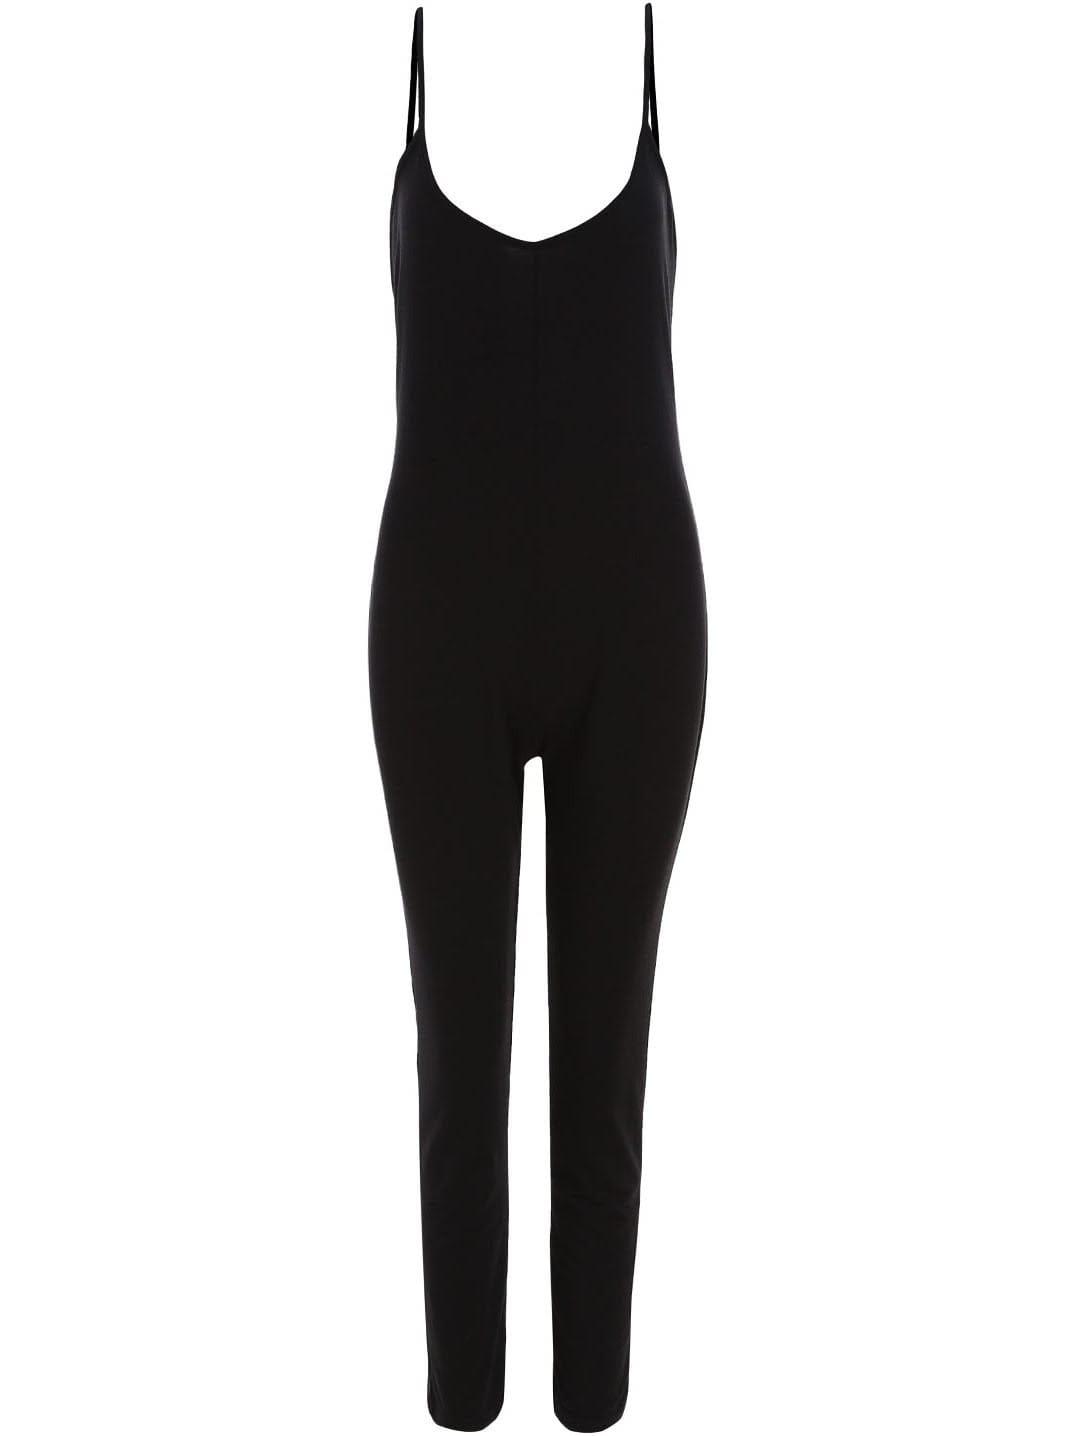 Spaghetti Strap Backless Slim Jumpsuit jumpsuit150529151